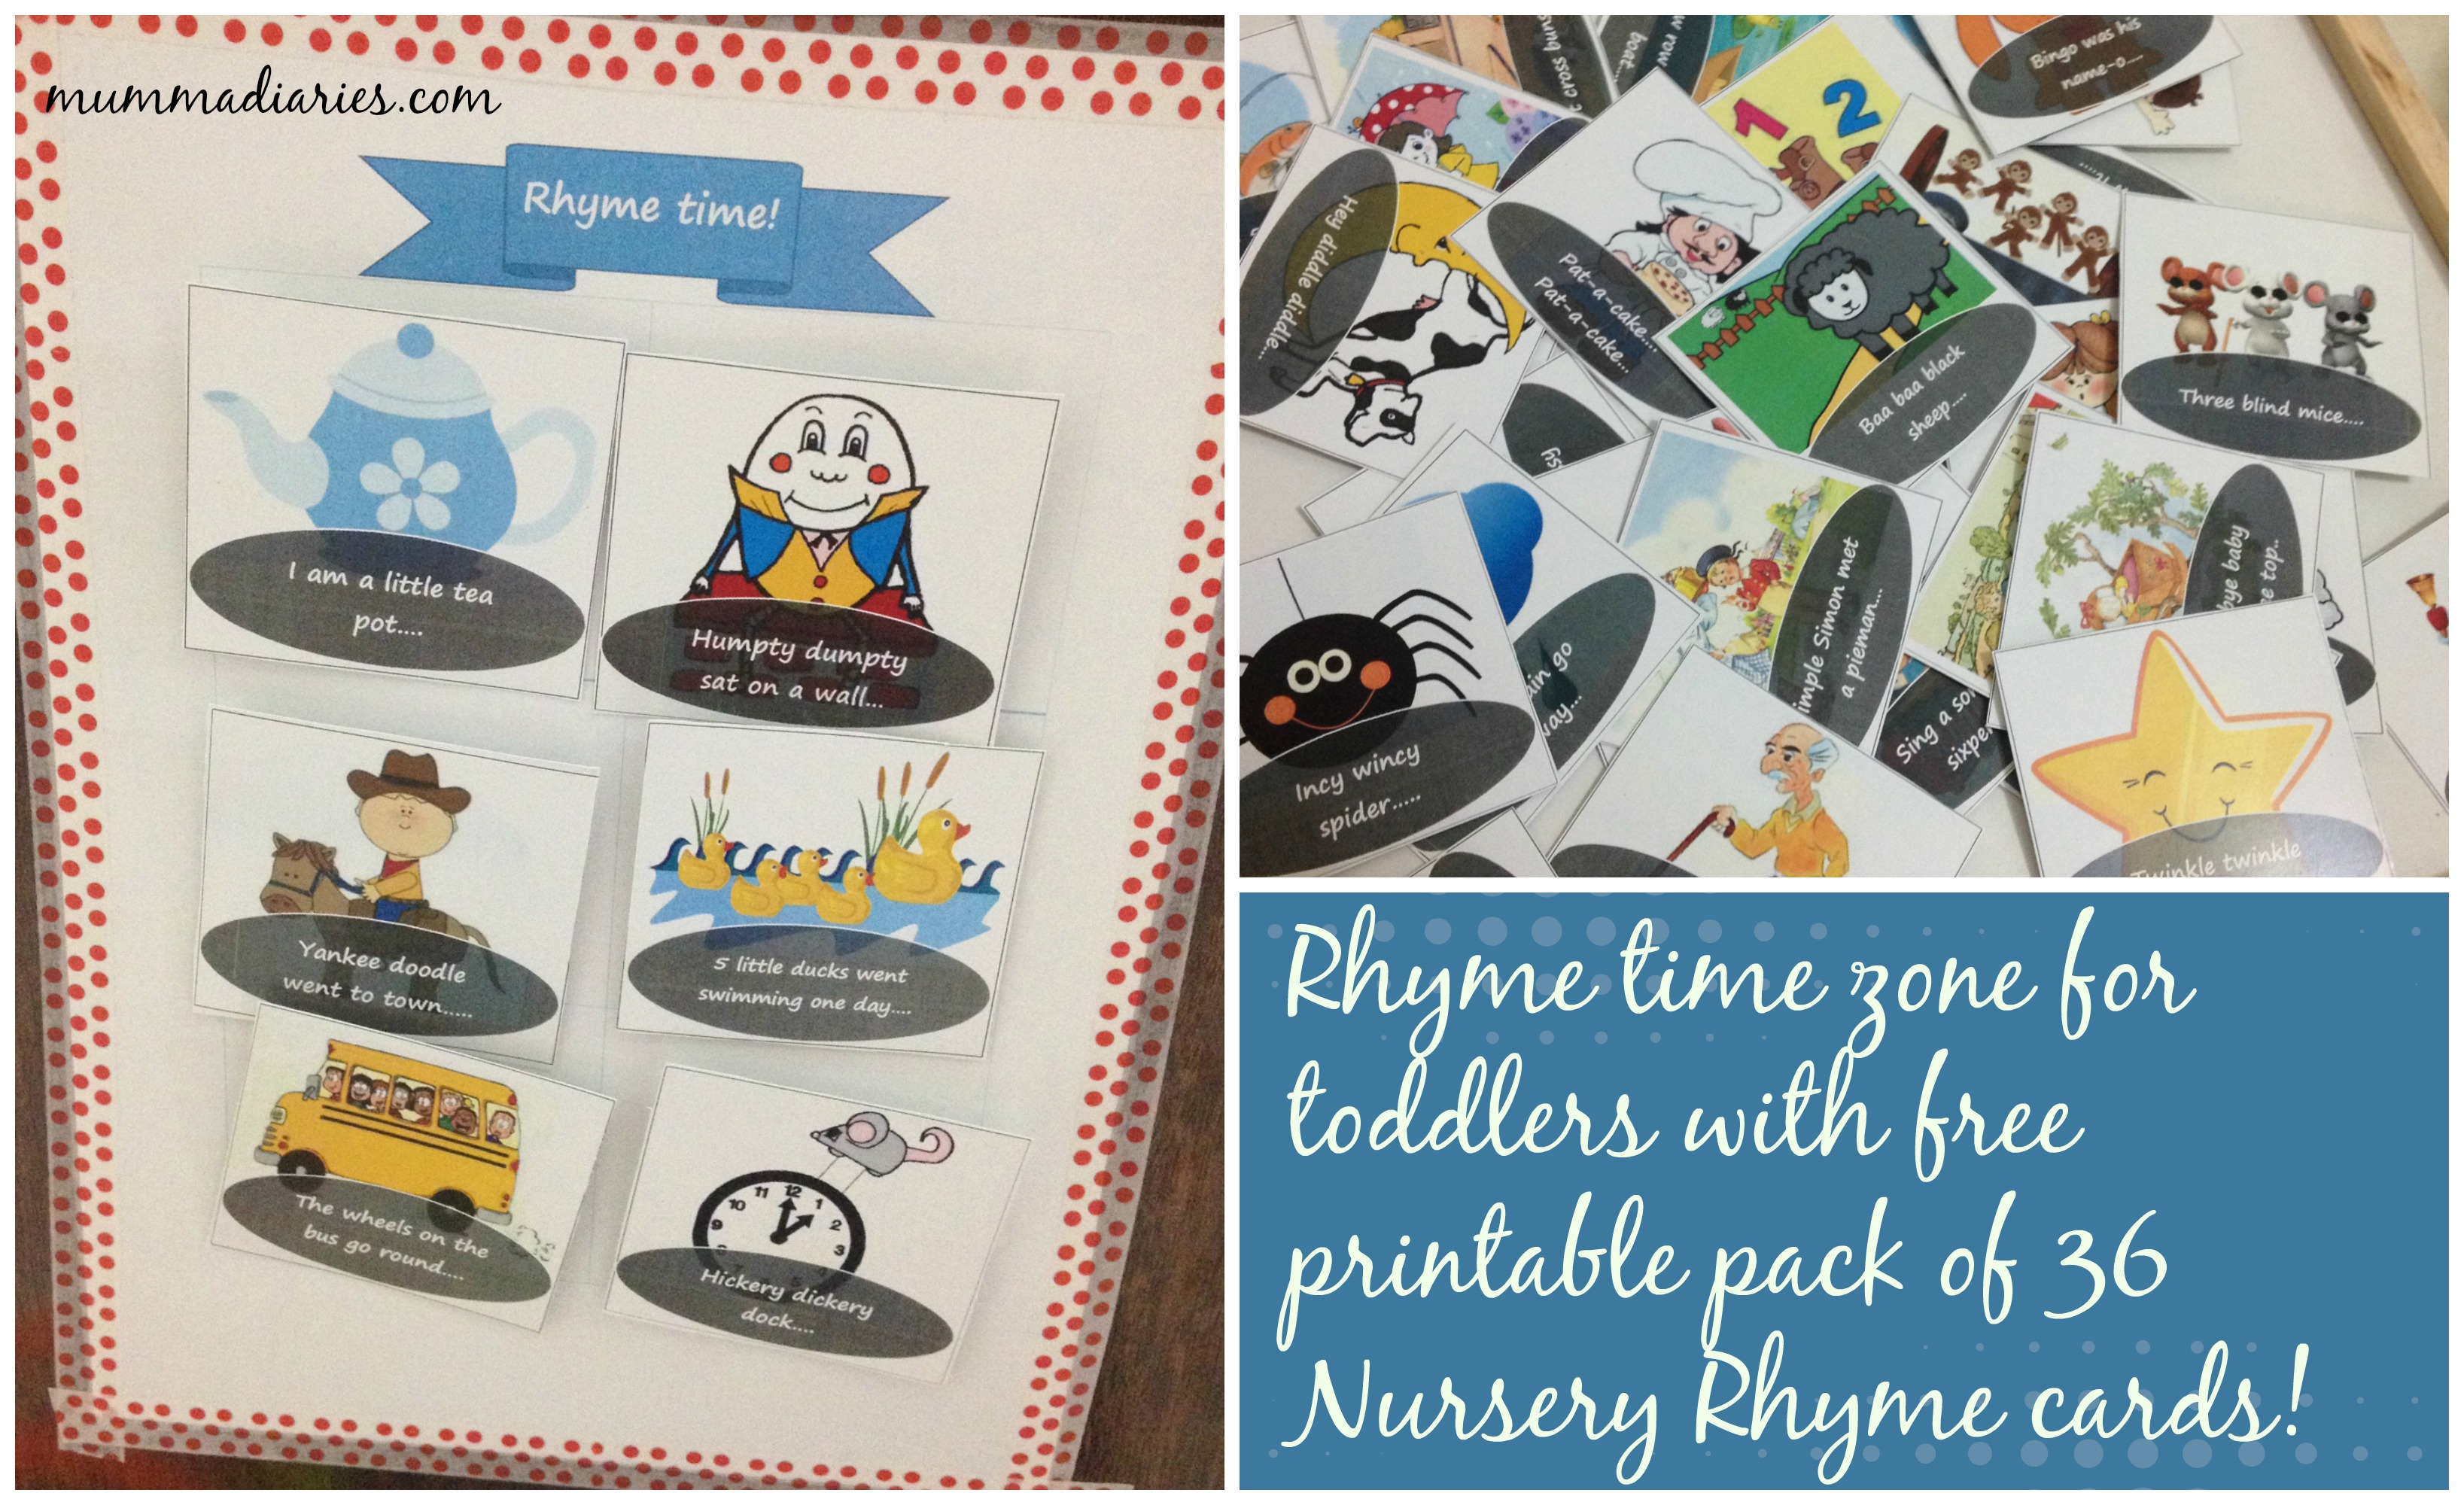 Nursery Rhyme Time Zone W 36 Free Nursery Rhyme Cards